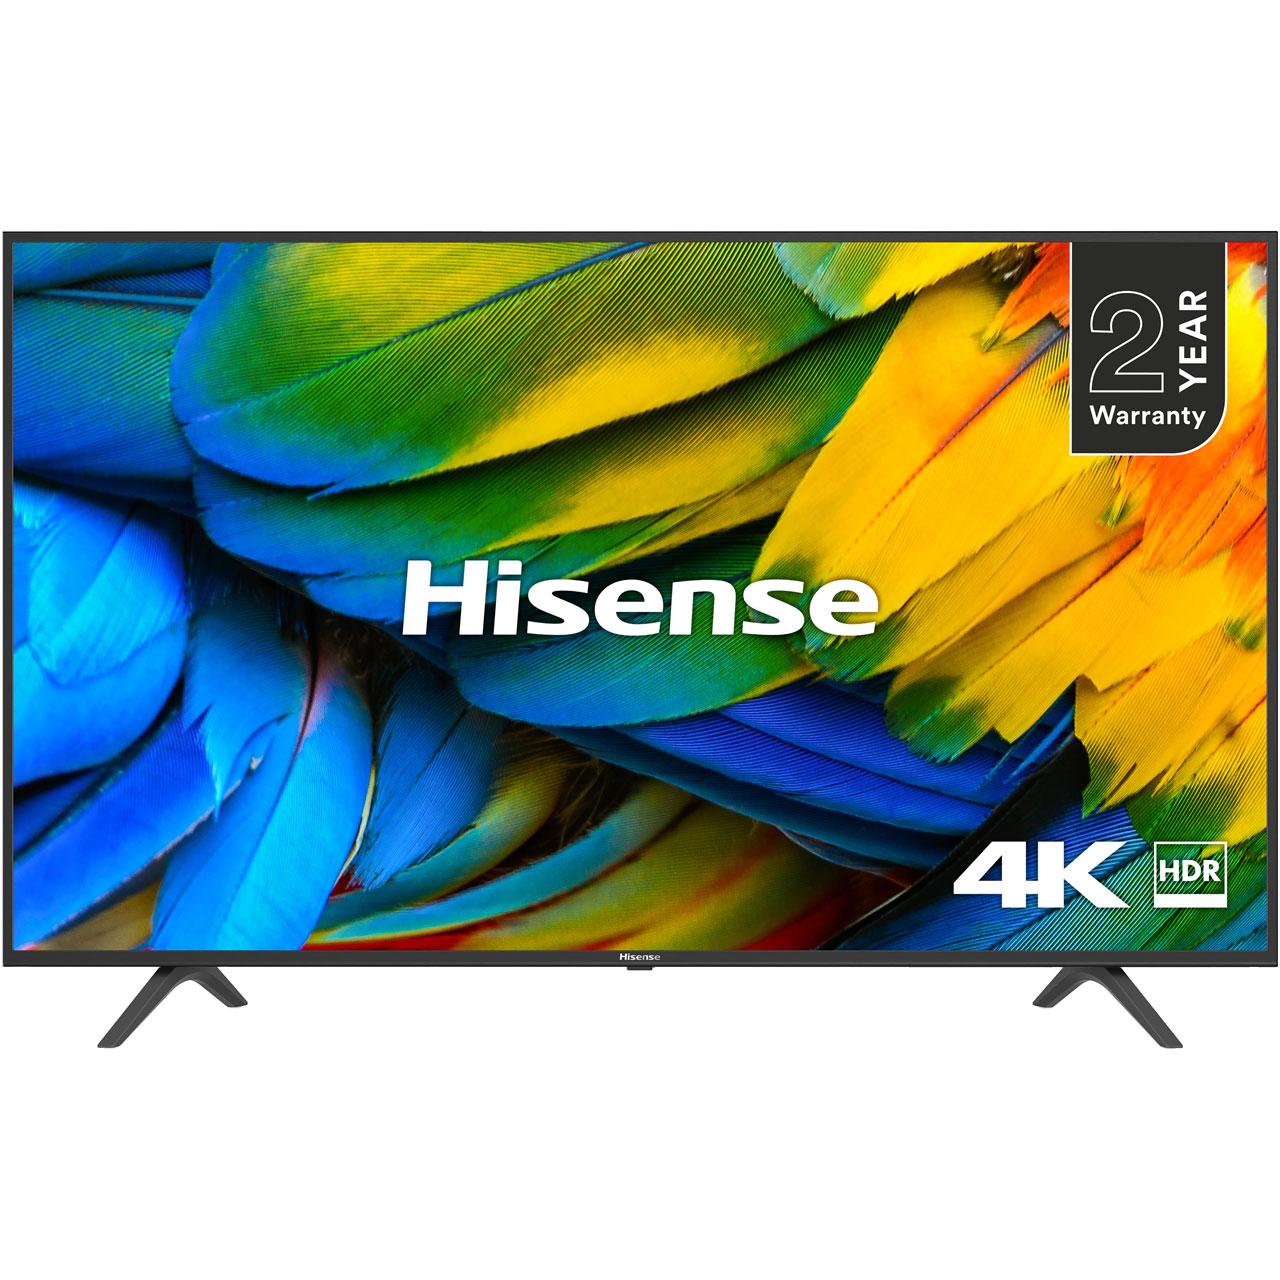 "Hisense H50B7100UK 50"" Smart 4K Ultra HD TV with HDR10 and DTS Studio Sound at ao.com £299"